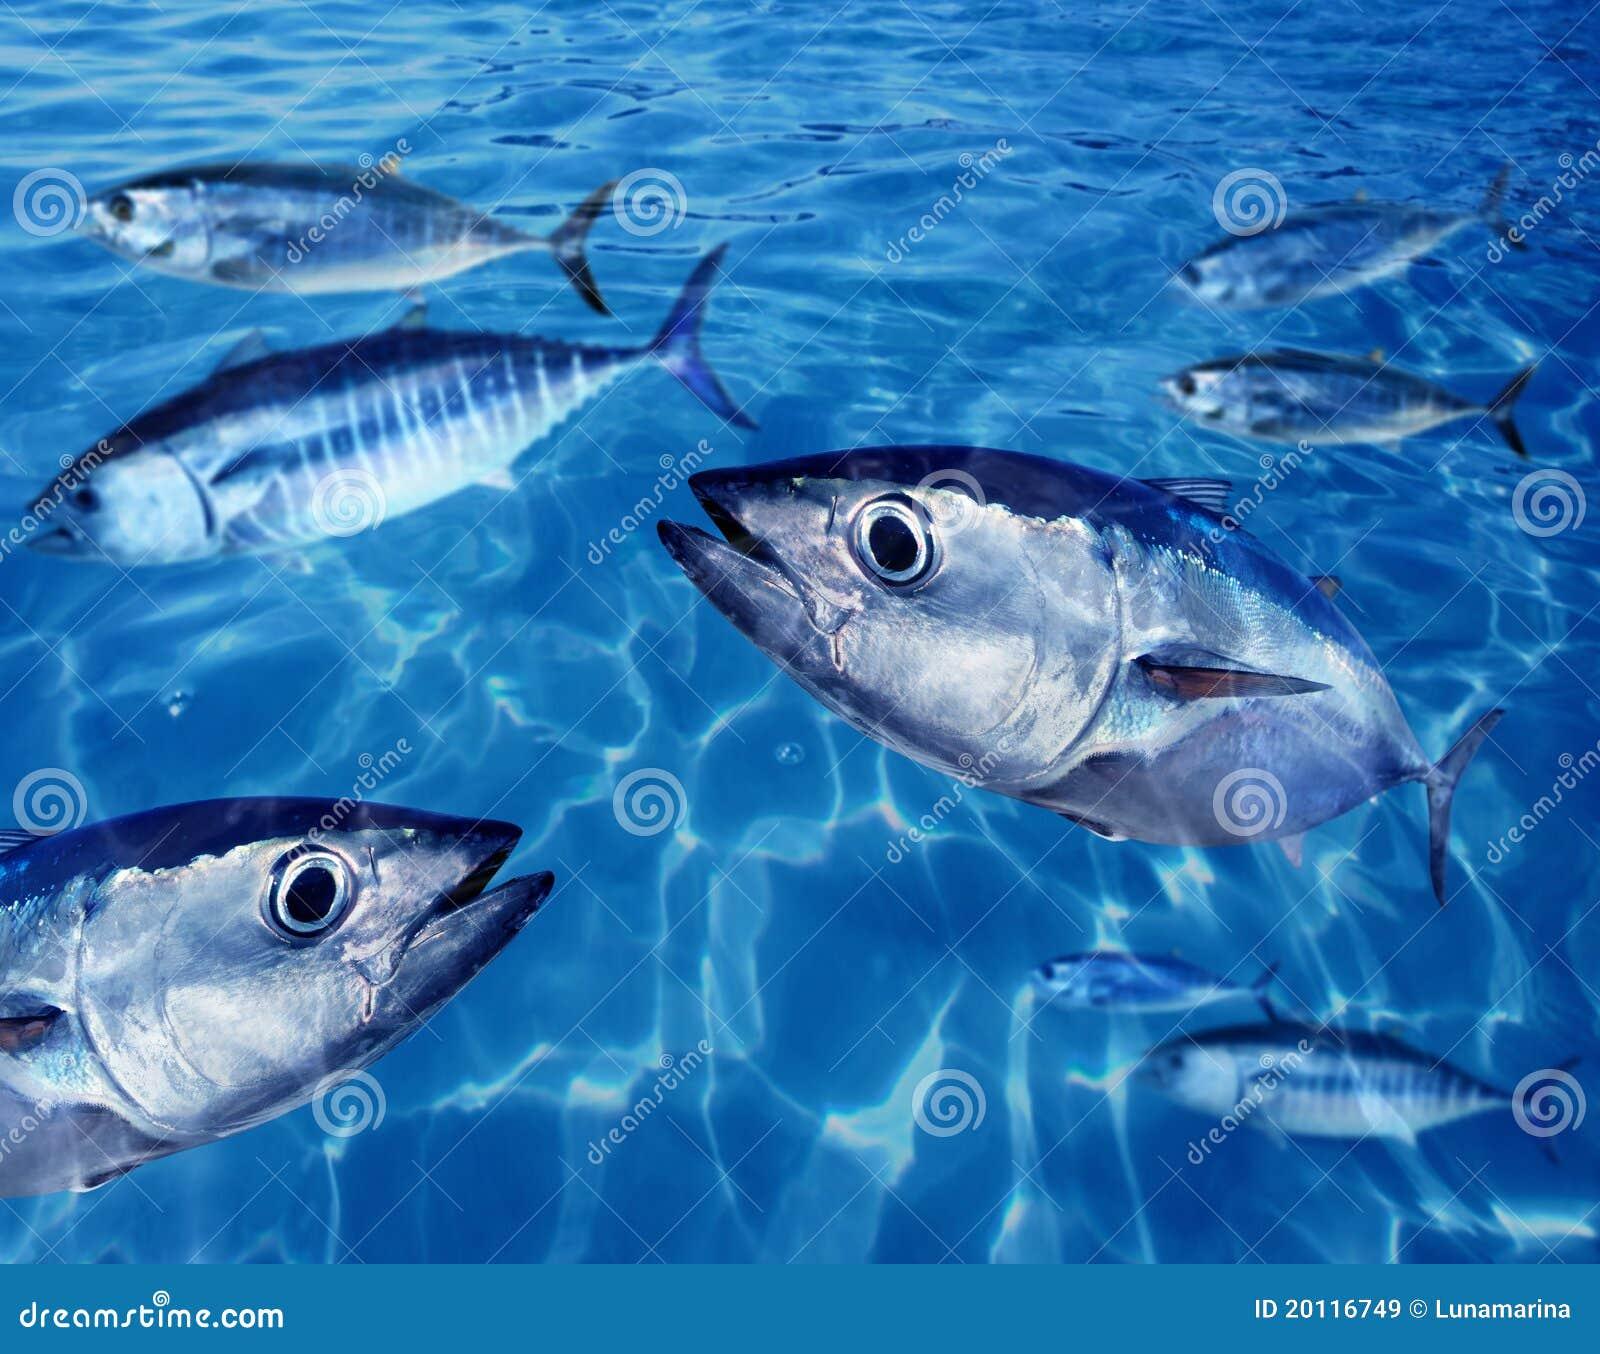 Bluefin tuna fish school underwater stock image image for Tuna fish price